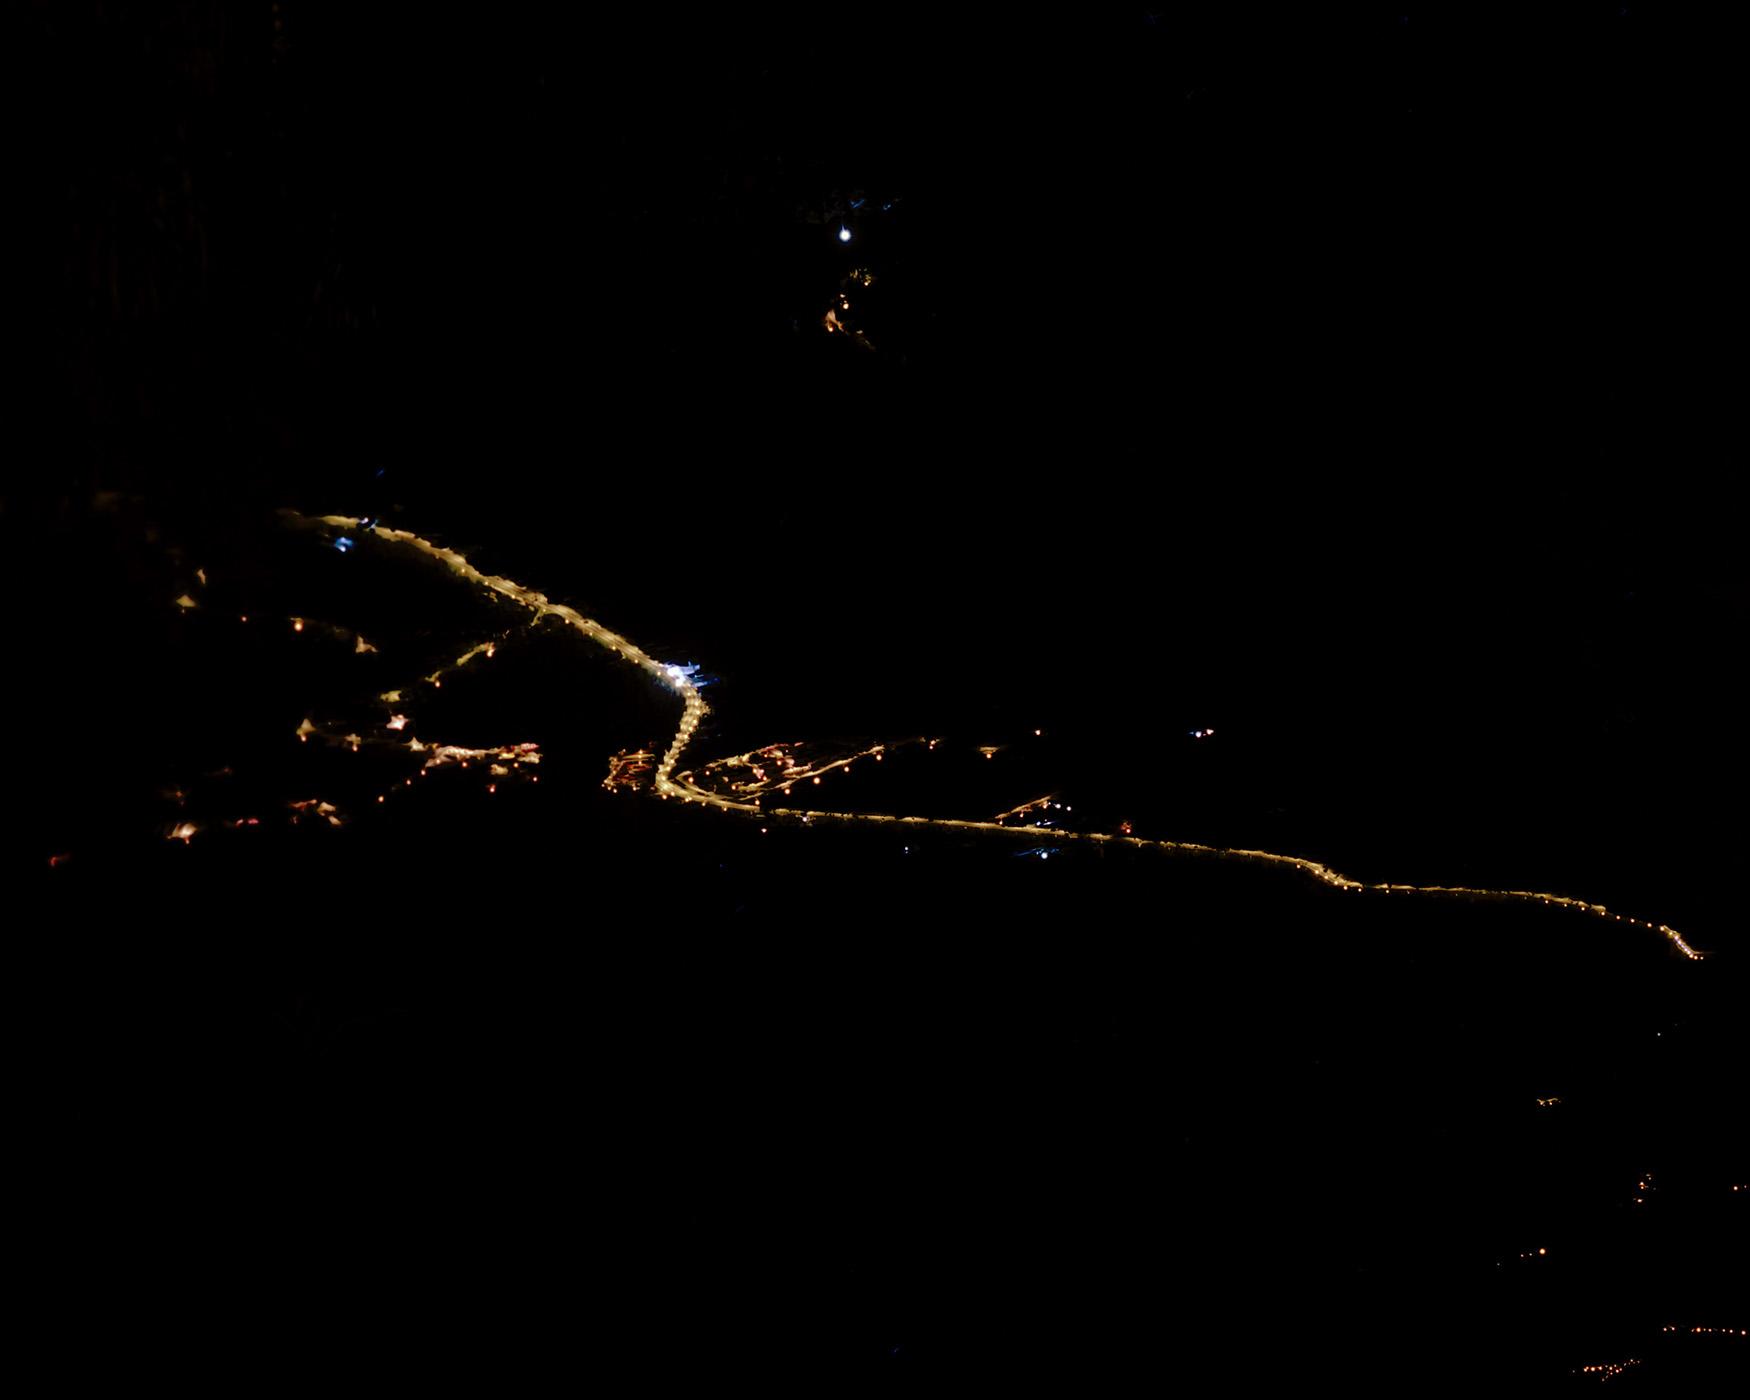 Tungurahua_024.jpg